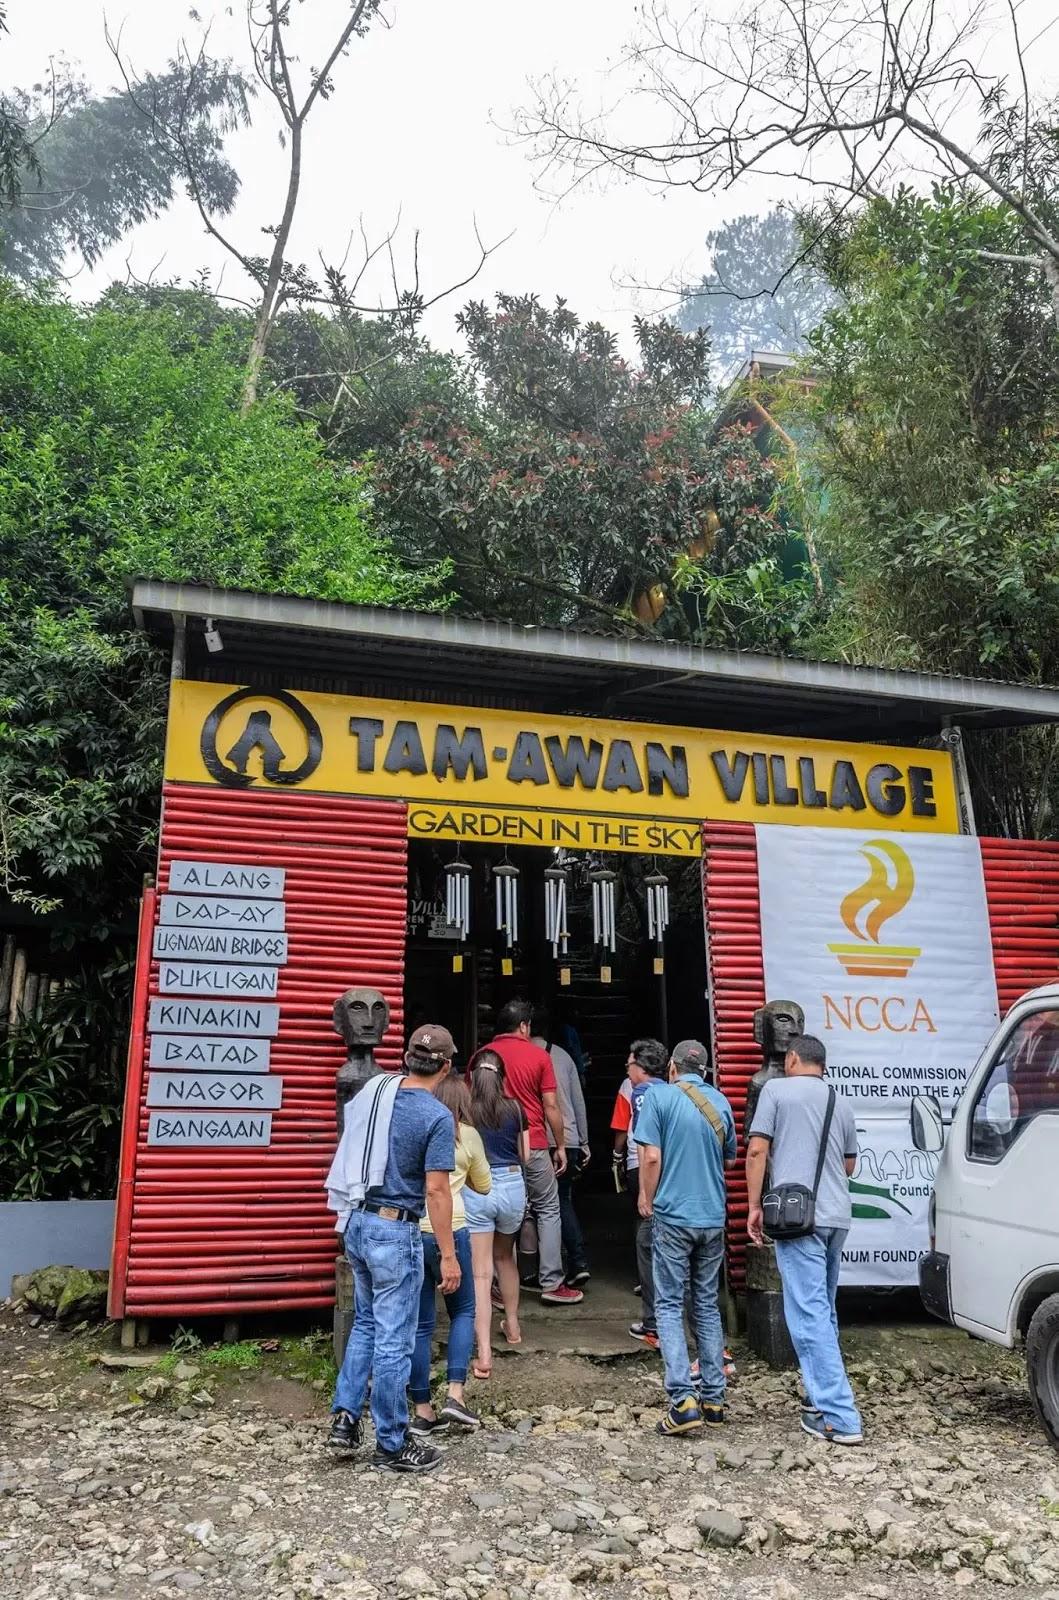 Tam-awan Village Baguio City Cordillera Administrative Region